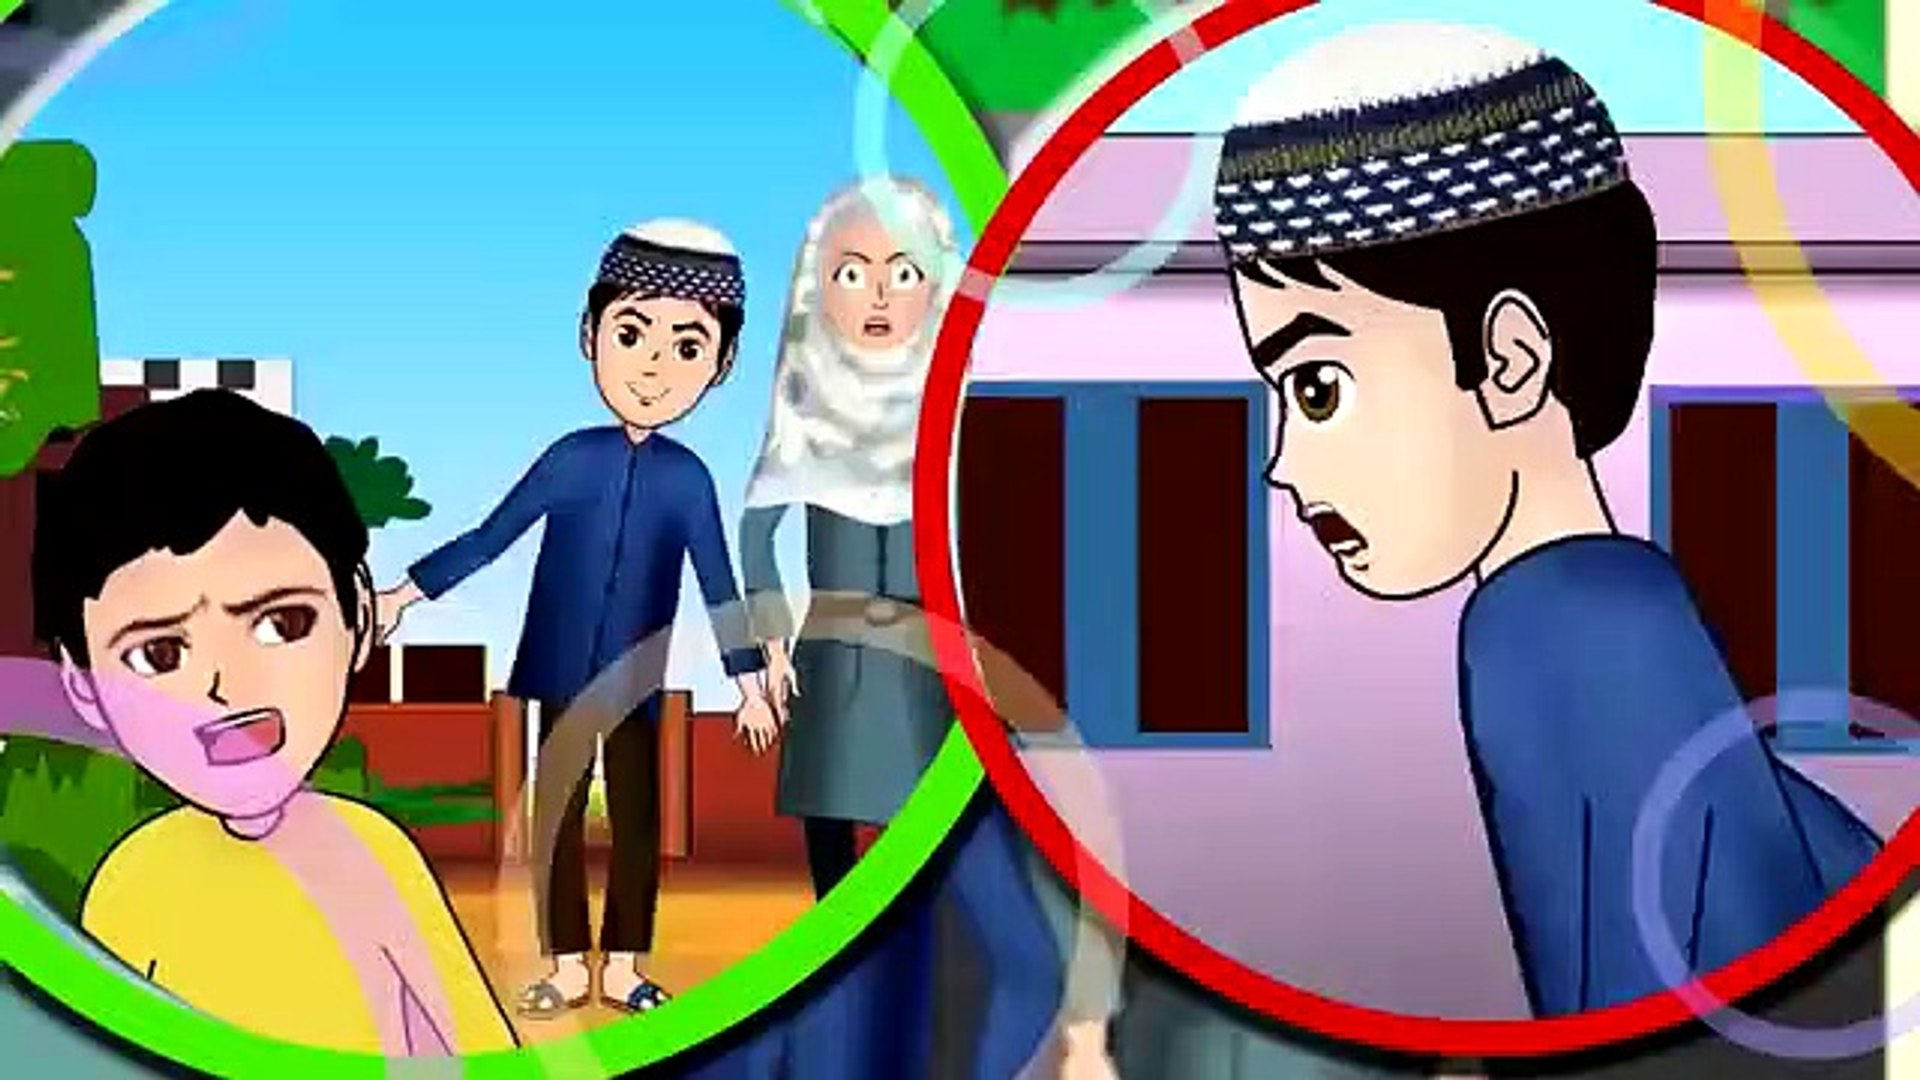 Angry Abdul Bari with friends Urdu Islamic Cartoons for children